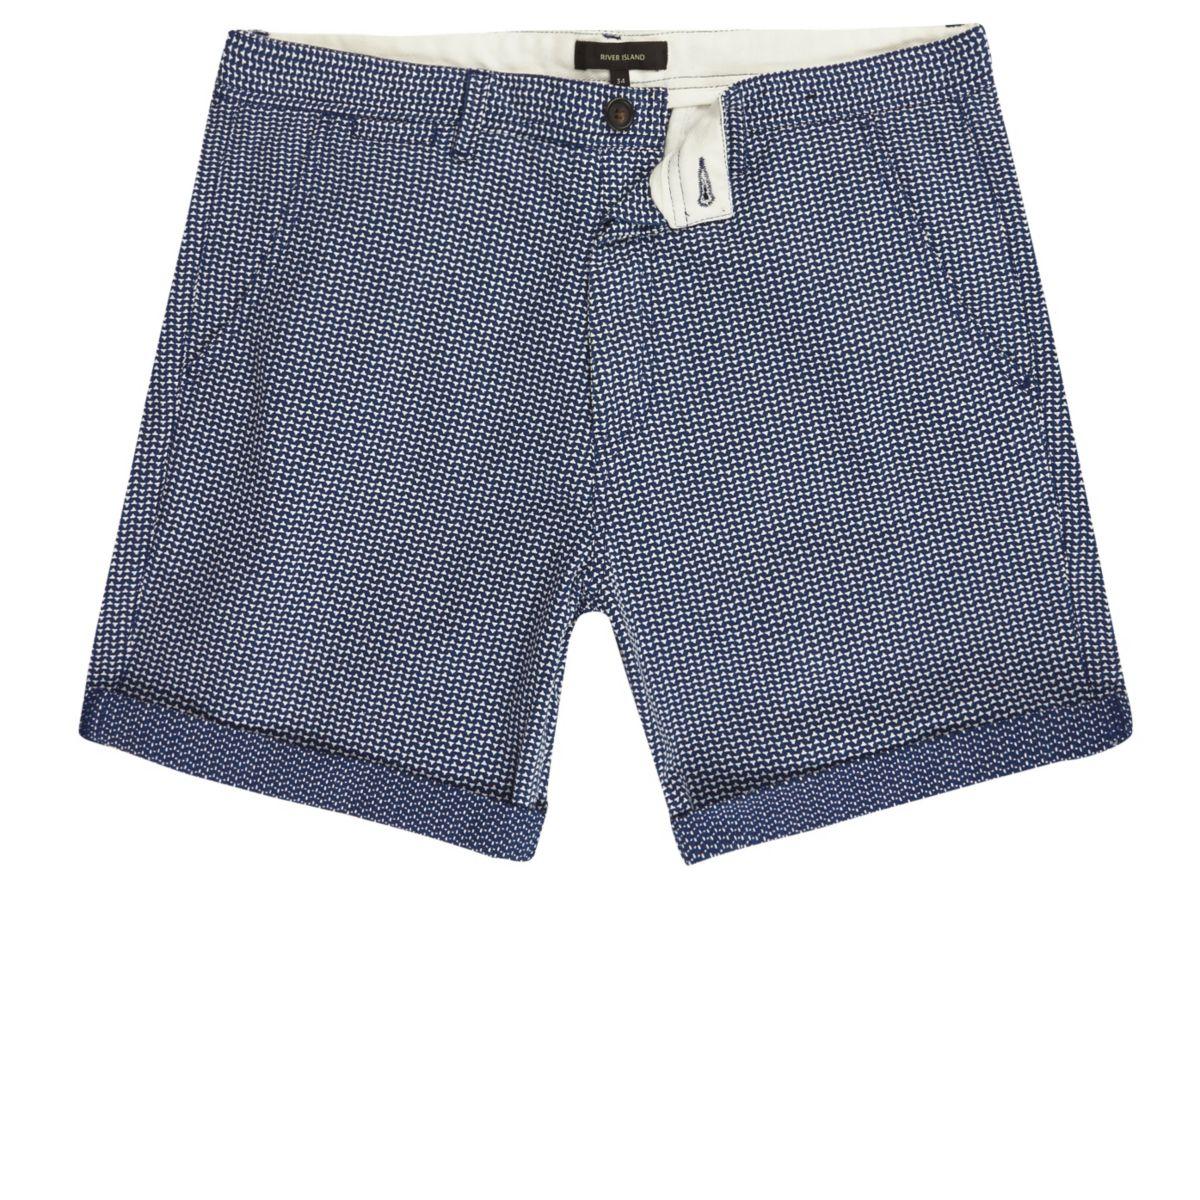 Navy blue textured slim fit shorts